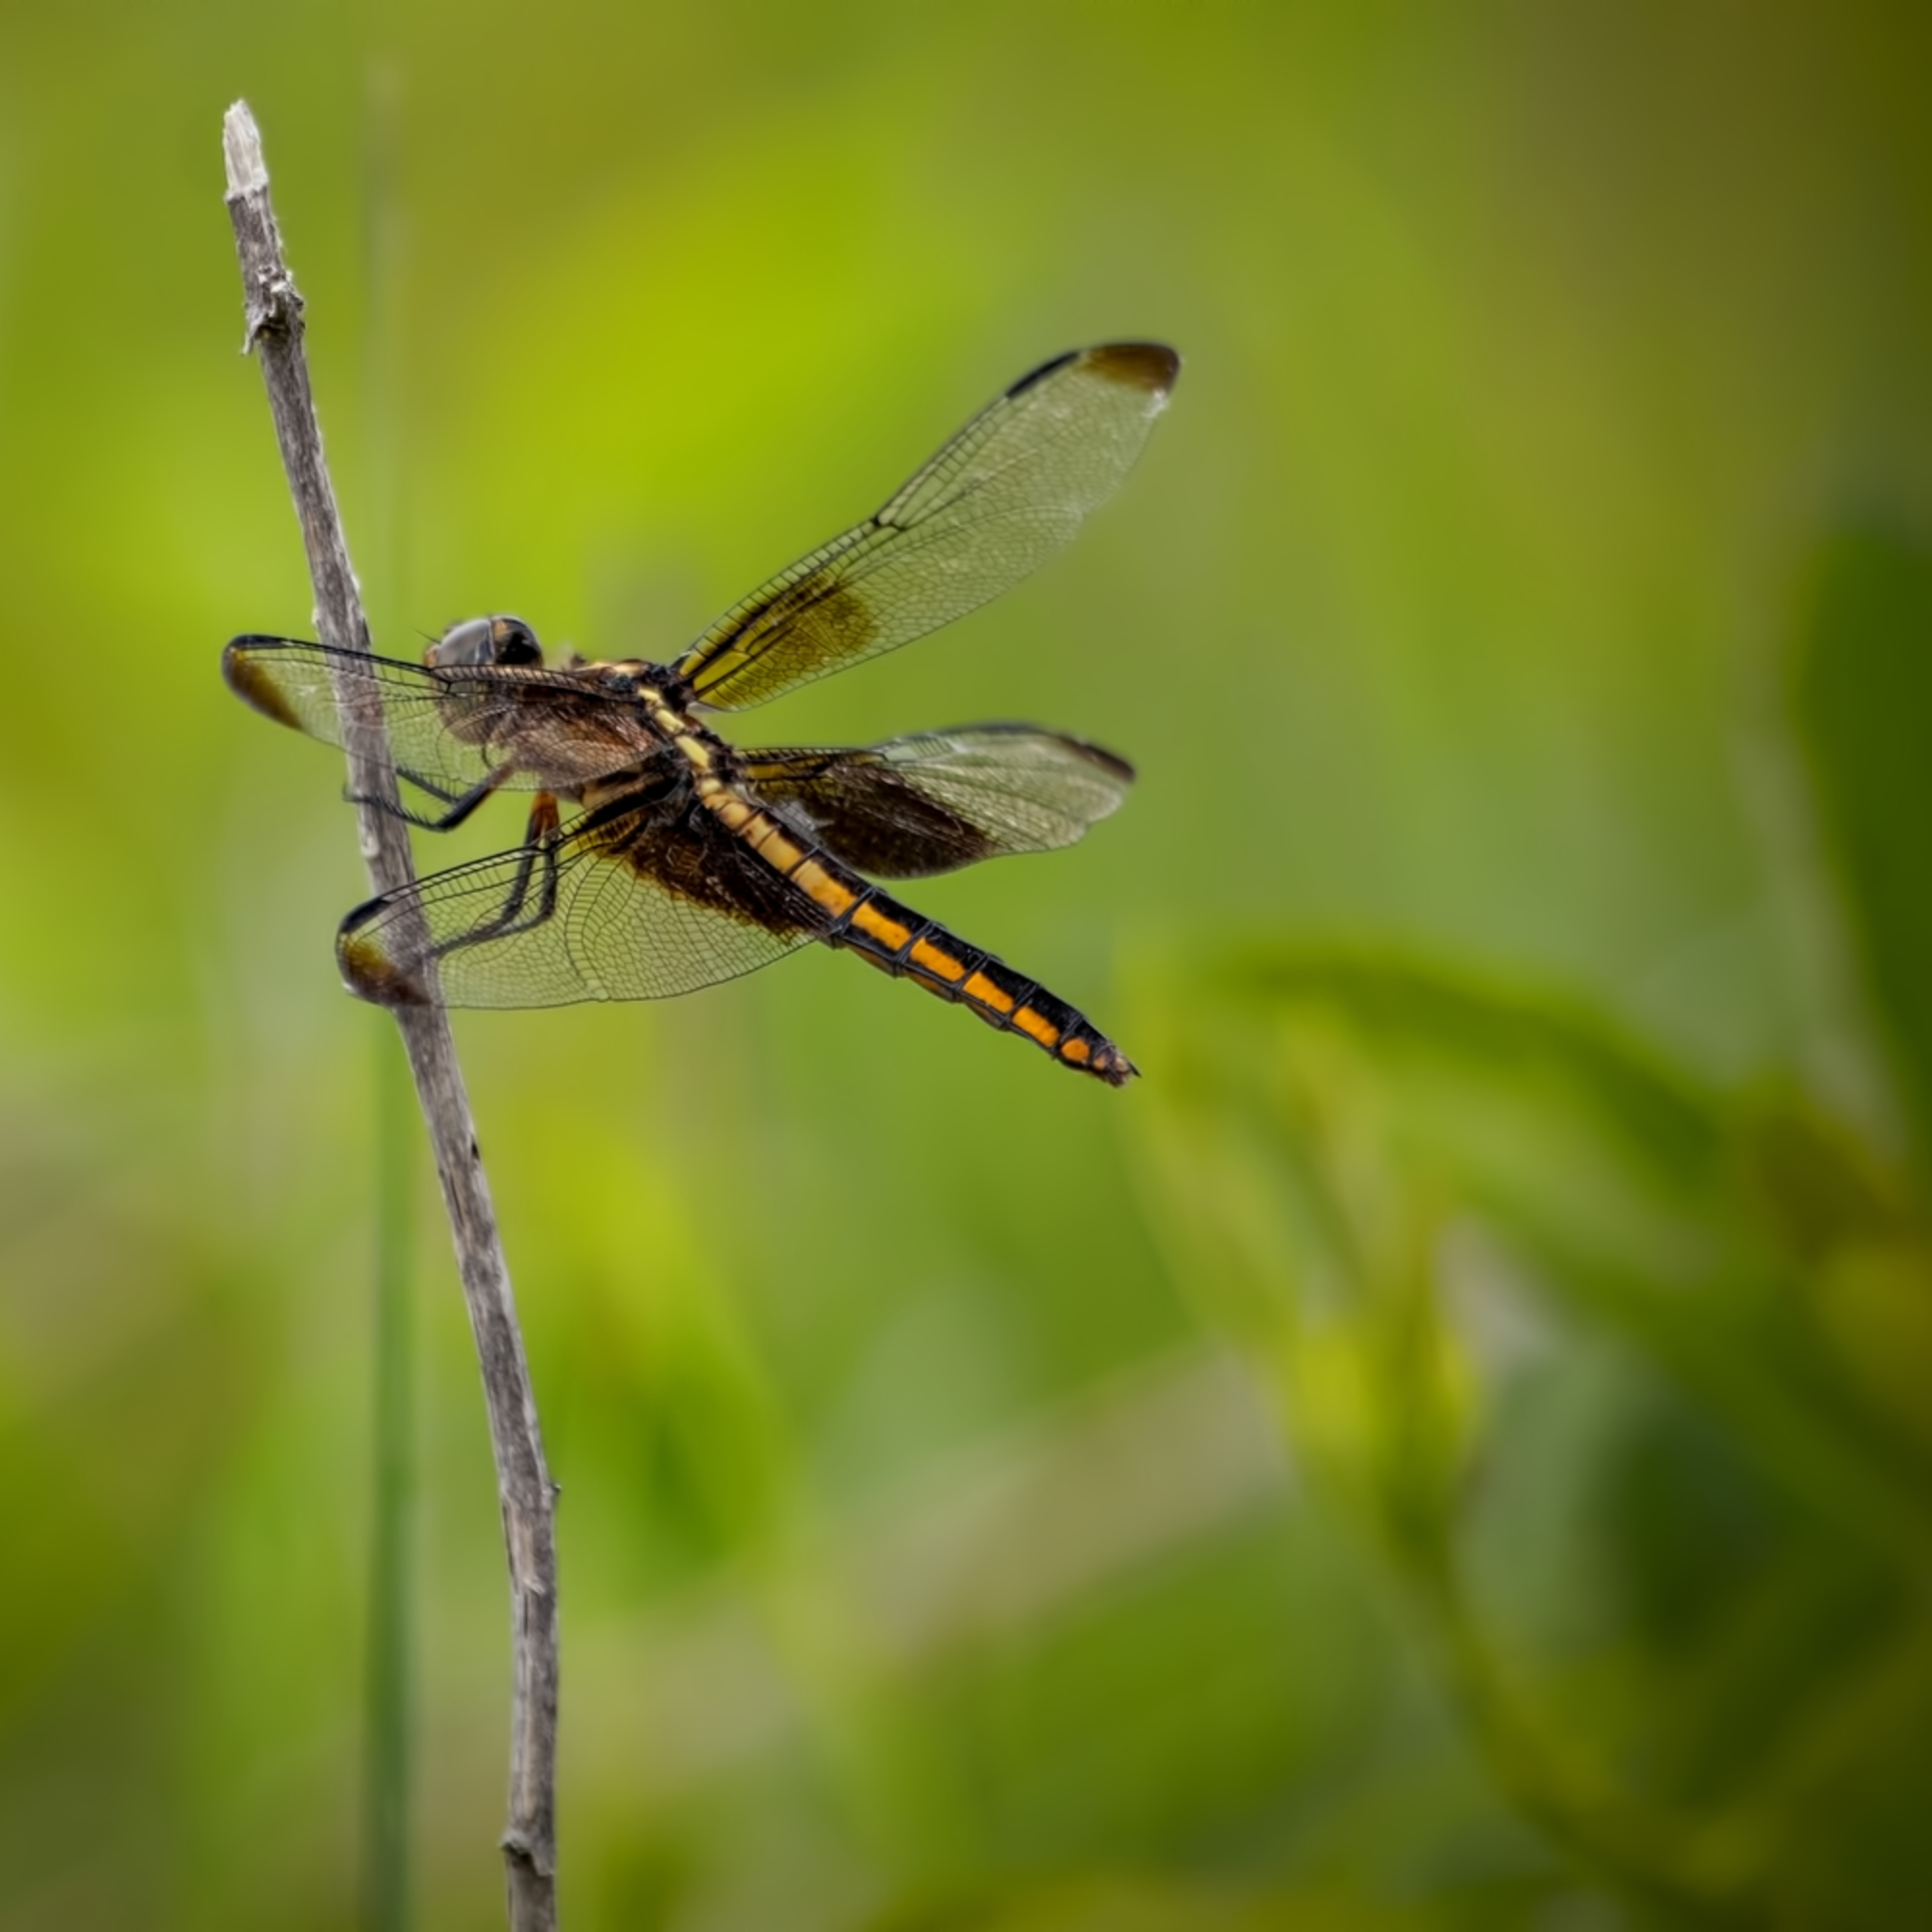 Dragonflies g  mg 6608 20fs koral martin i5wqhe